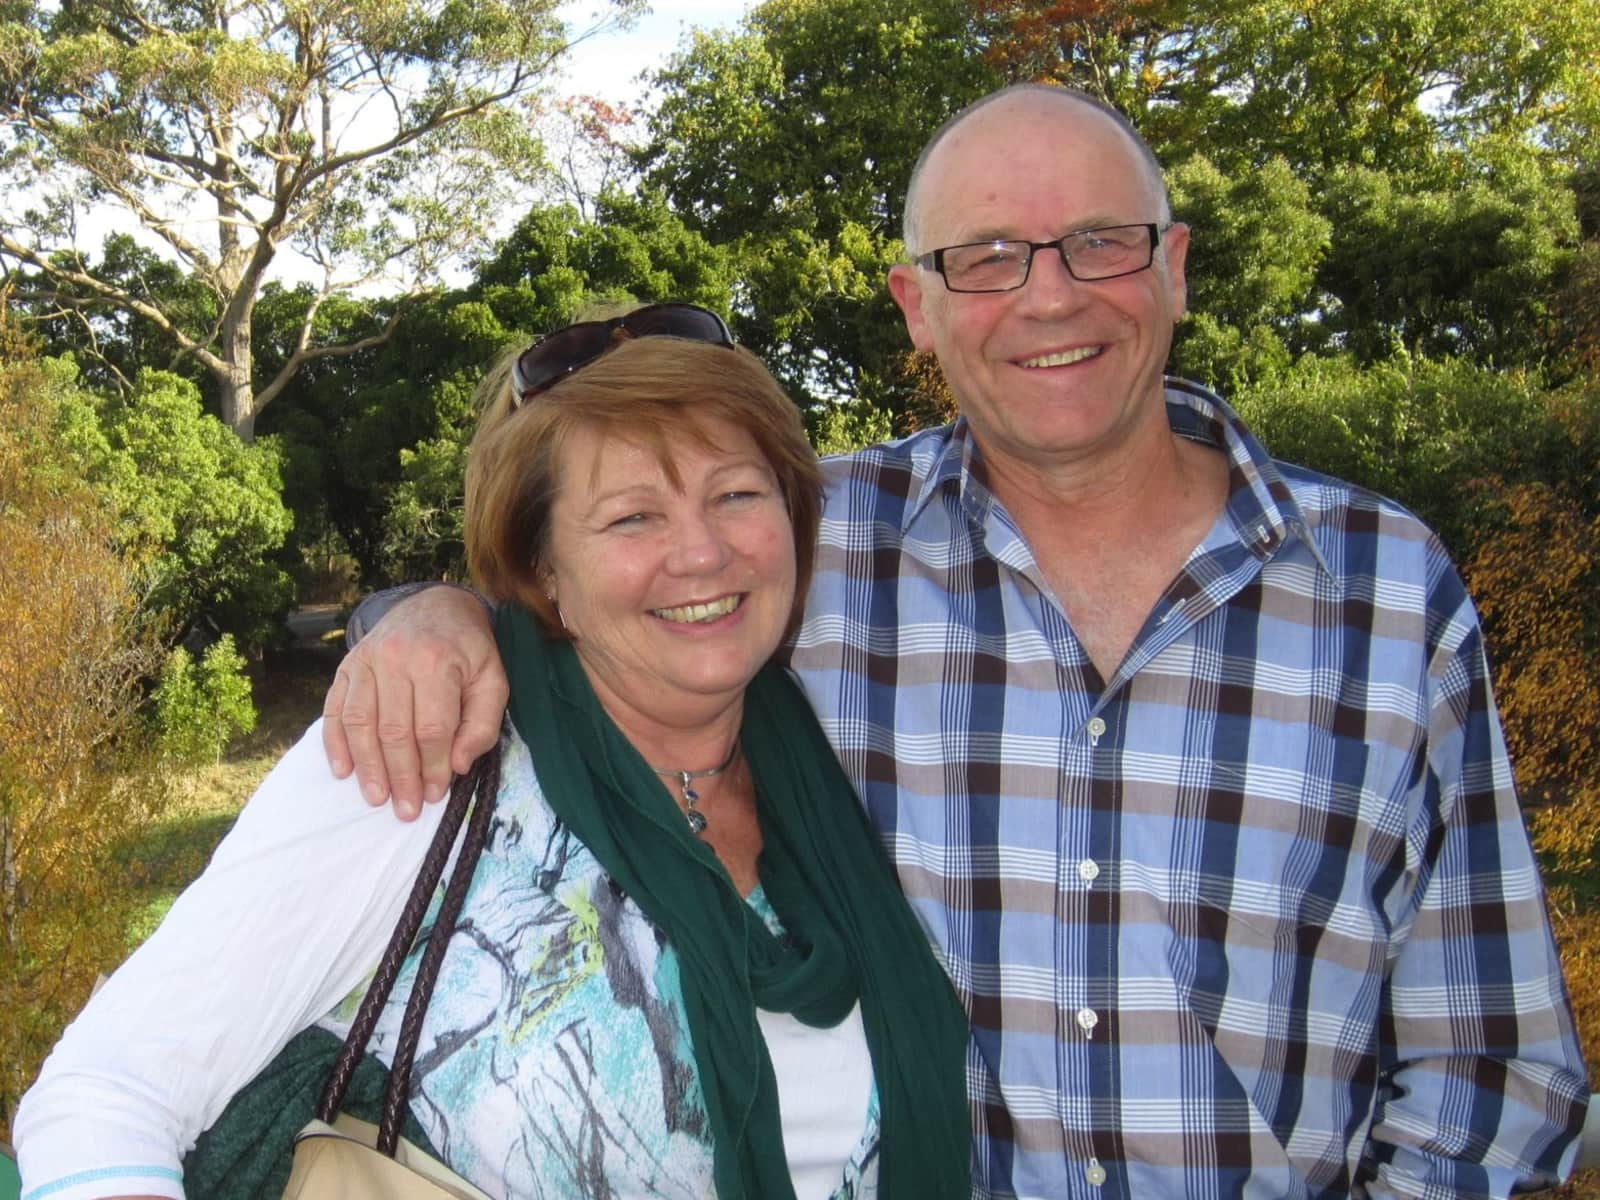 Vicki & Rick from Hobart, Tasmania, Australia